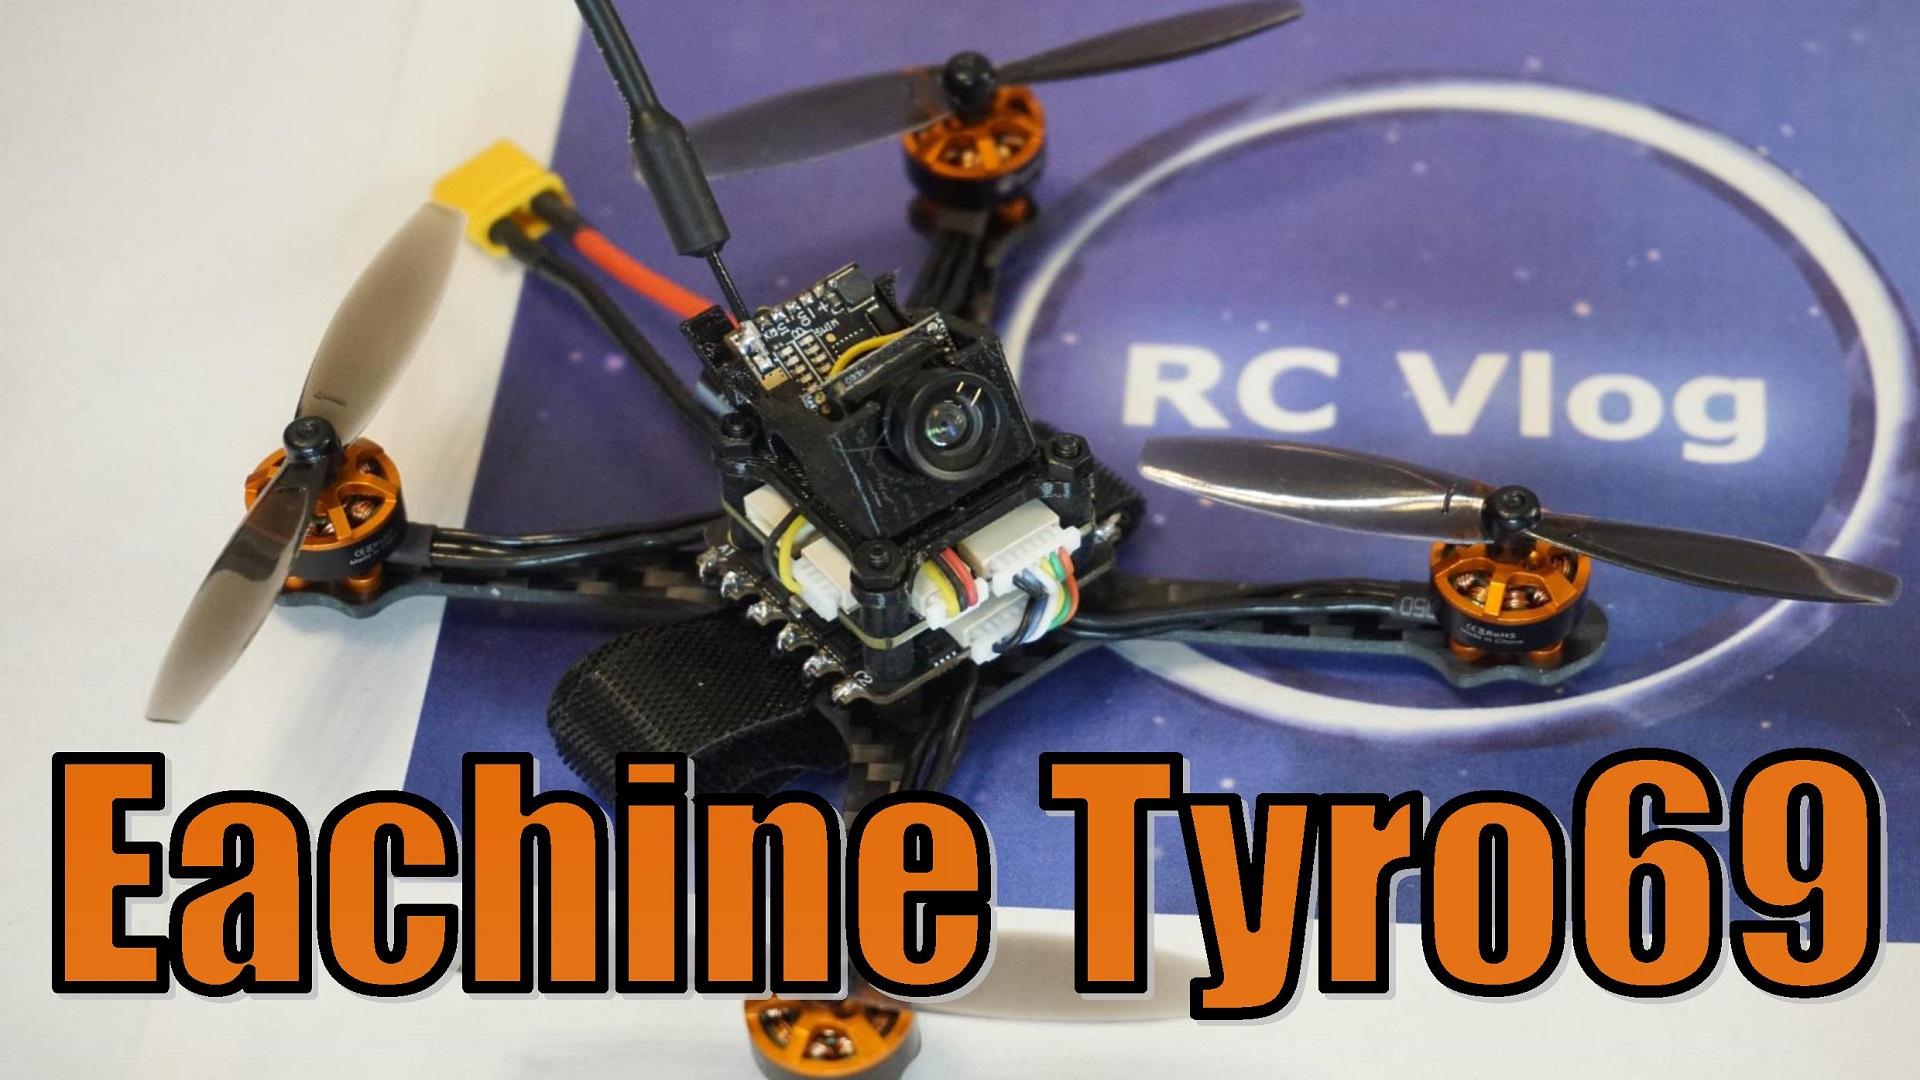 Eachine Tyro69